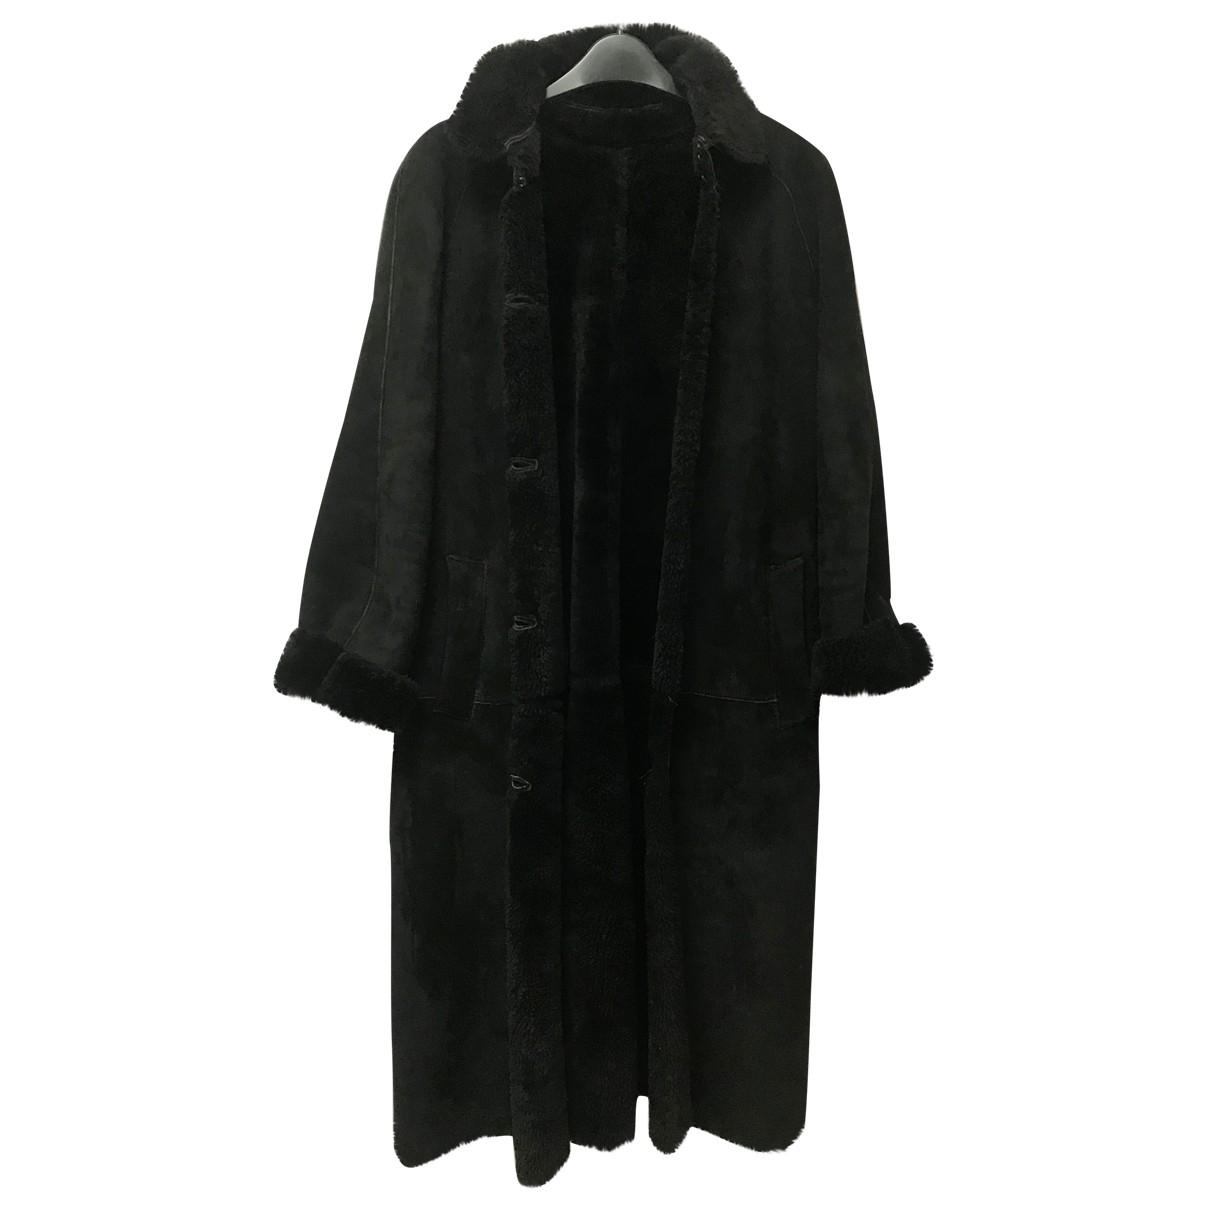 Burberry \N Black Shearling coat for Women 6 UK